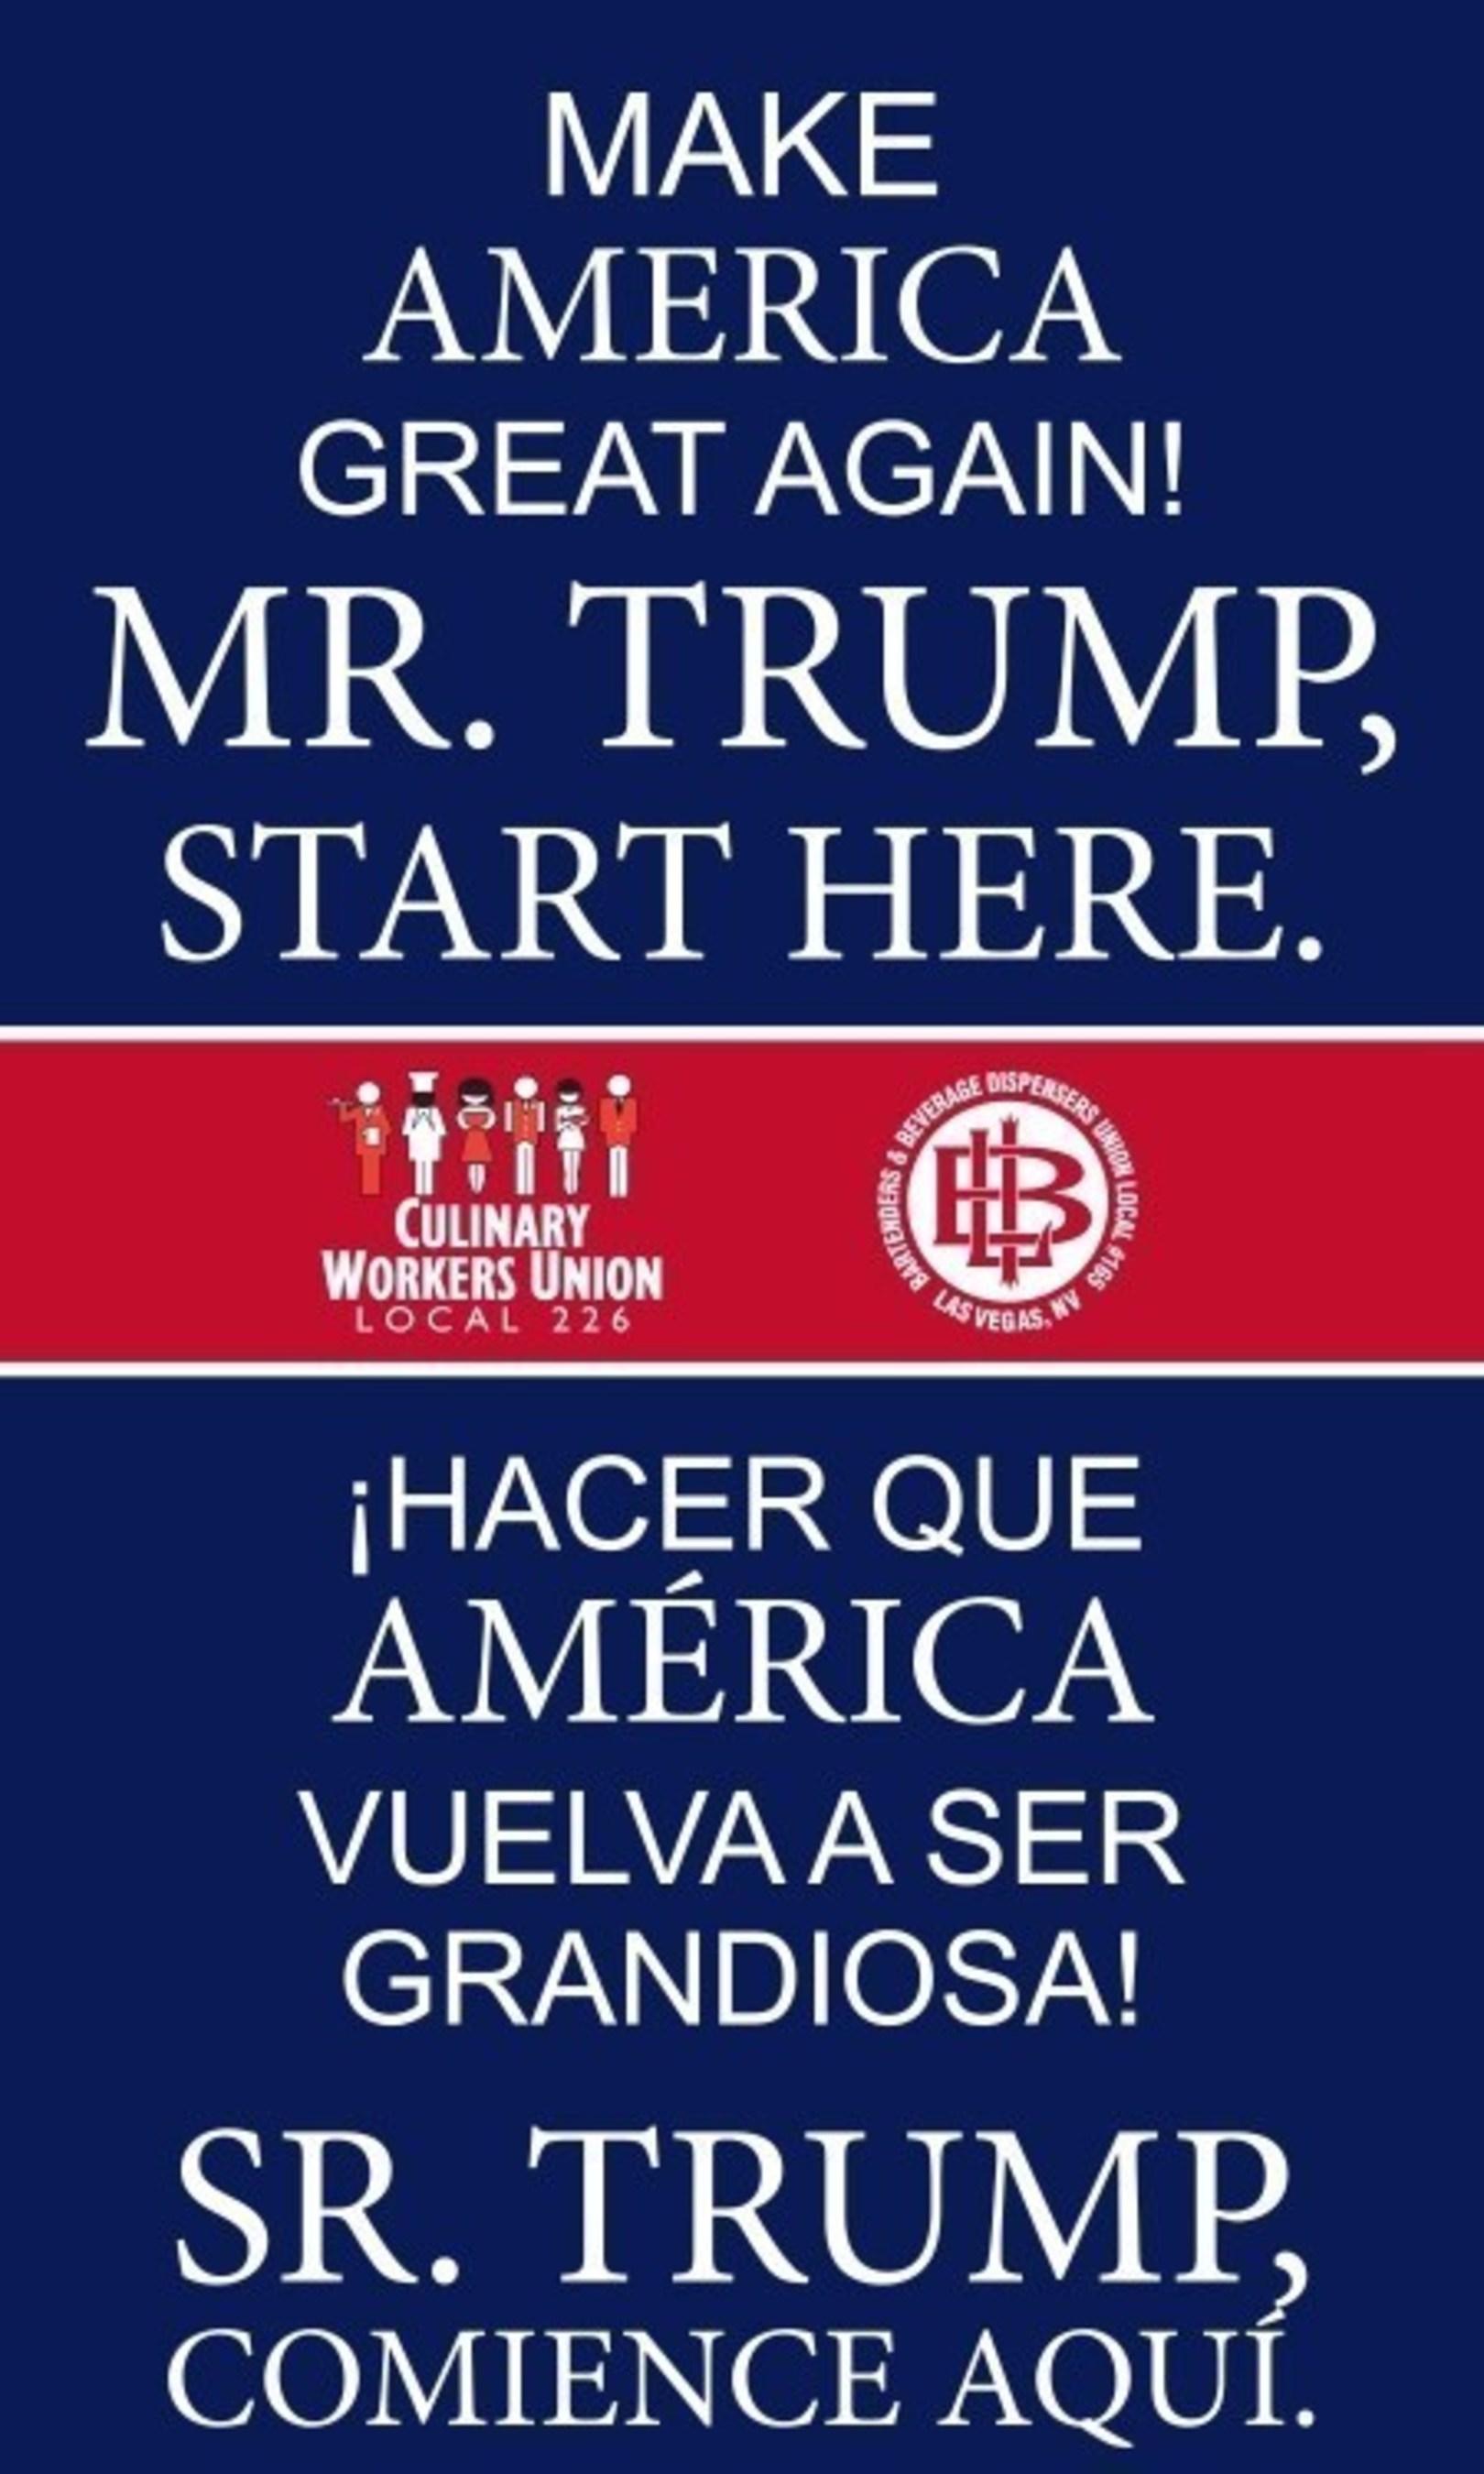 Mr. Trump, make America great again!